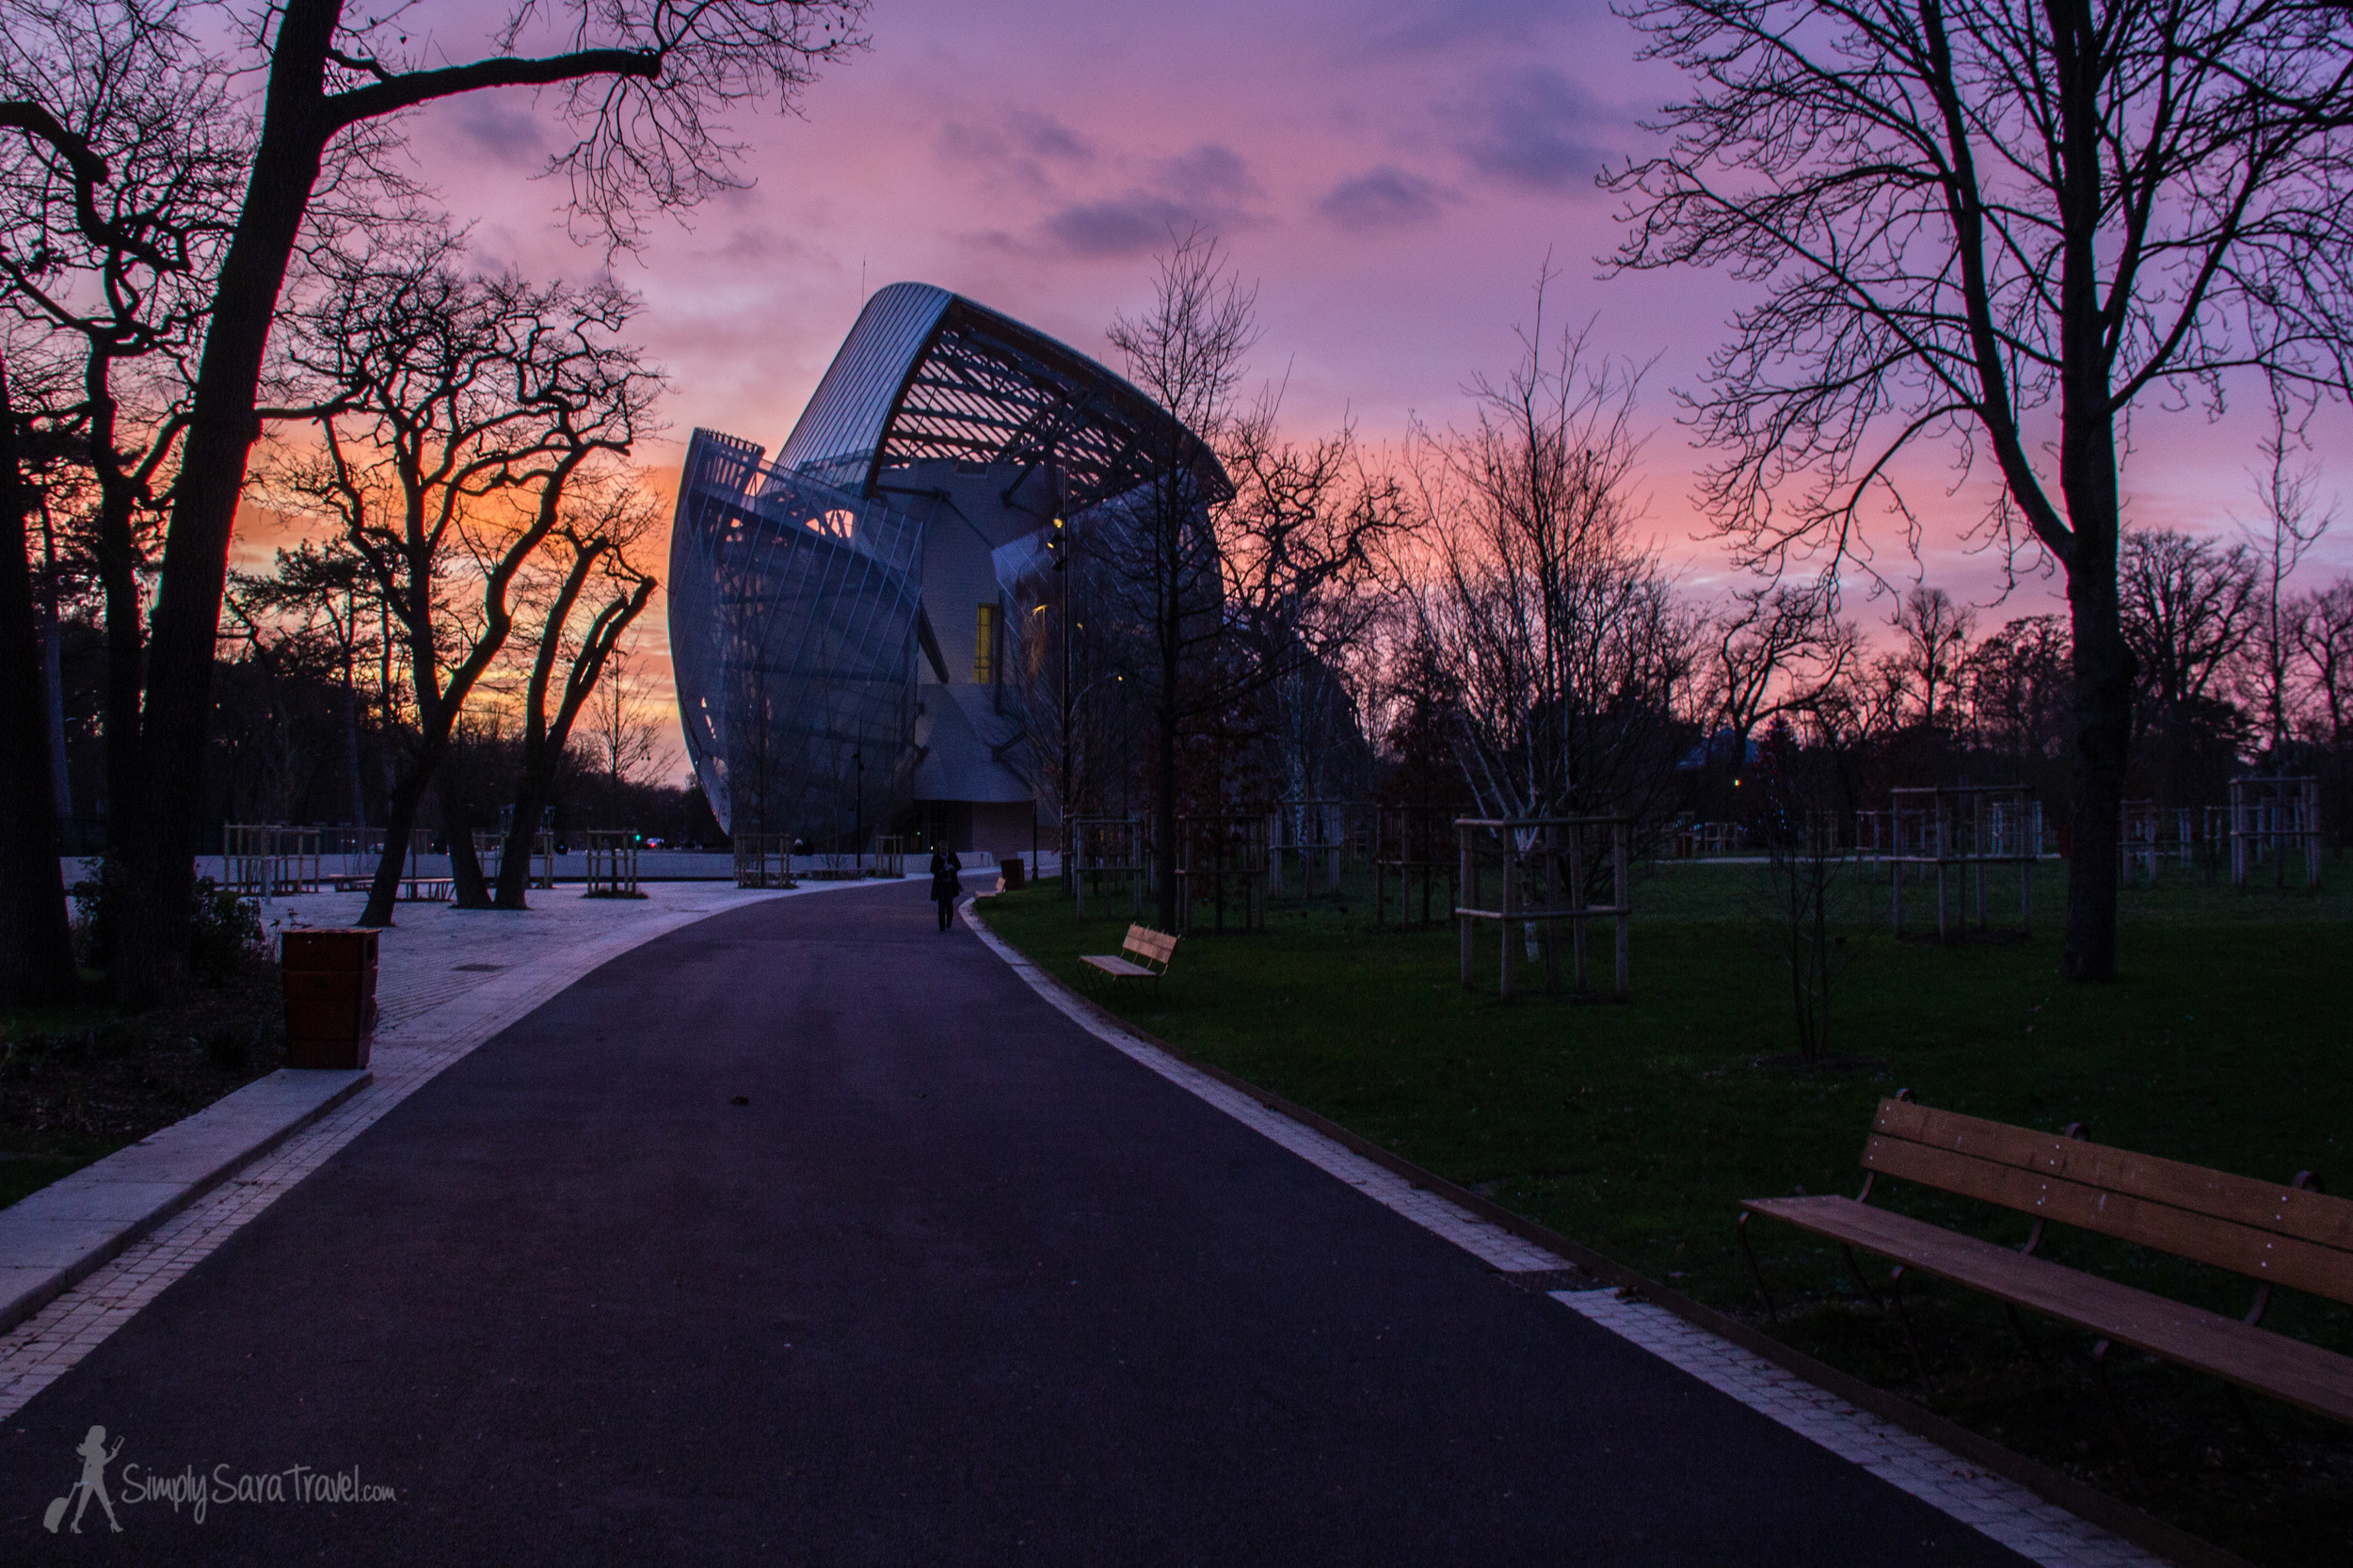 Vibrant sunset atJardin d'Acclimatation with Fondation Louis Vuitton in western Paris, France